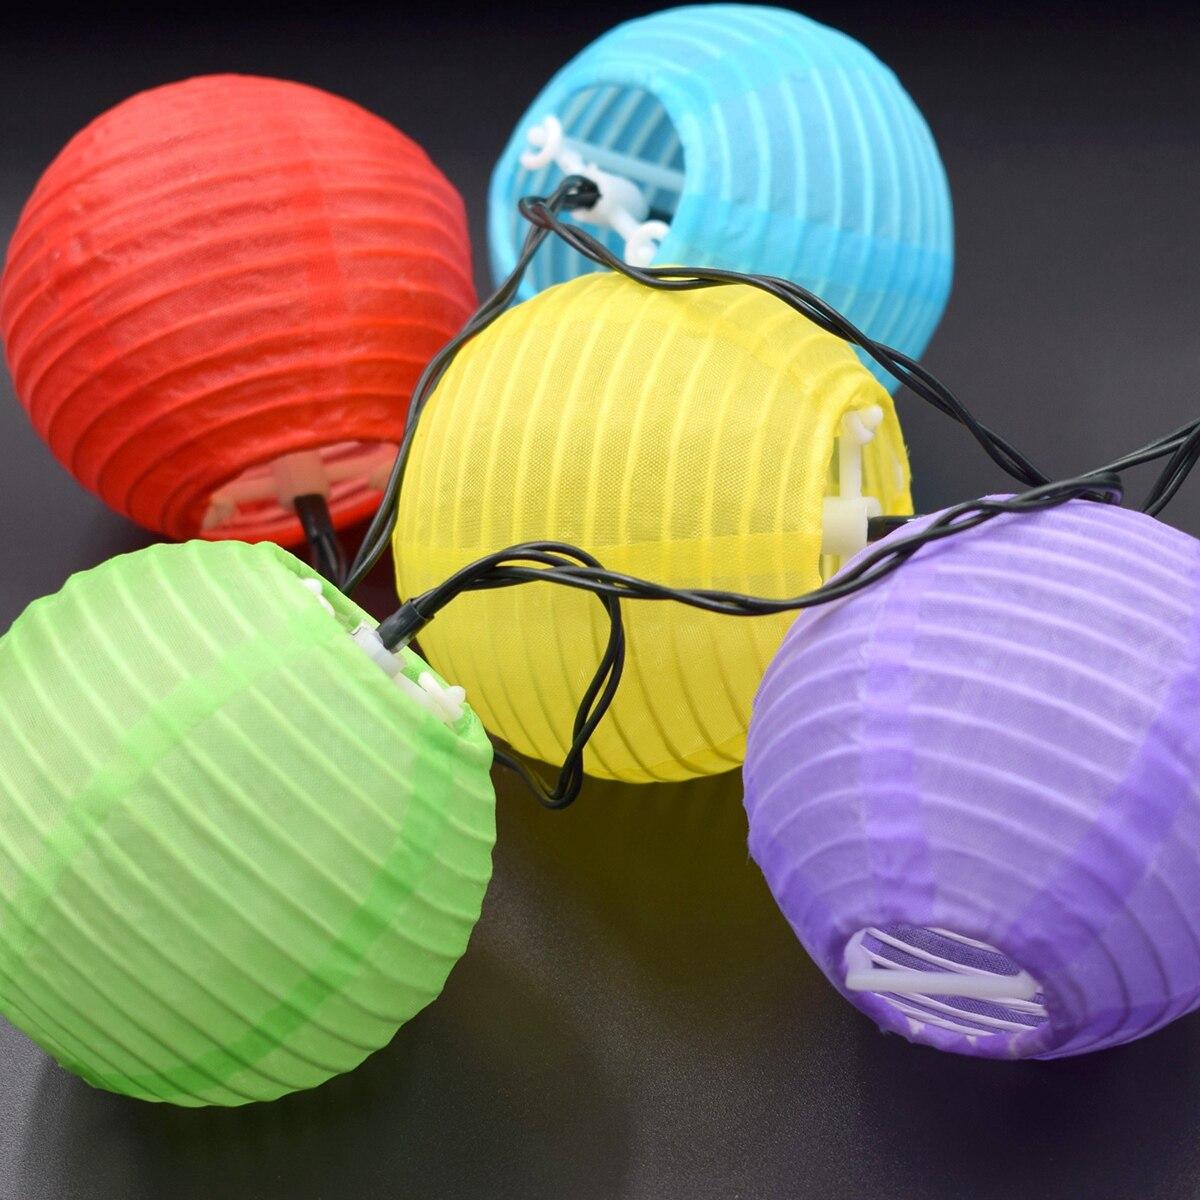 $ Cross-Border led Lights String Maple String Lights Halloween Battery Box Small Lanterns Wedding Holiday Outdoor Decorative Lights String 1.5 m 10 Light Battery Maple Leaf Warm Light A